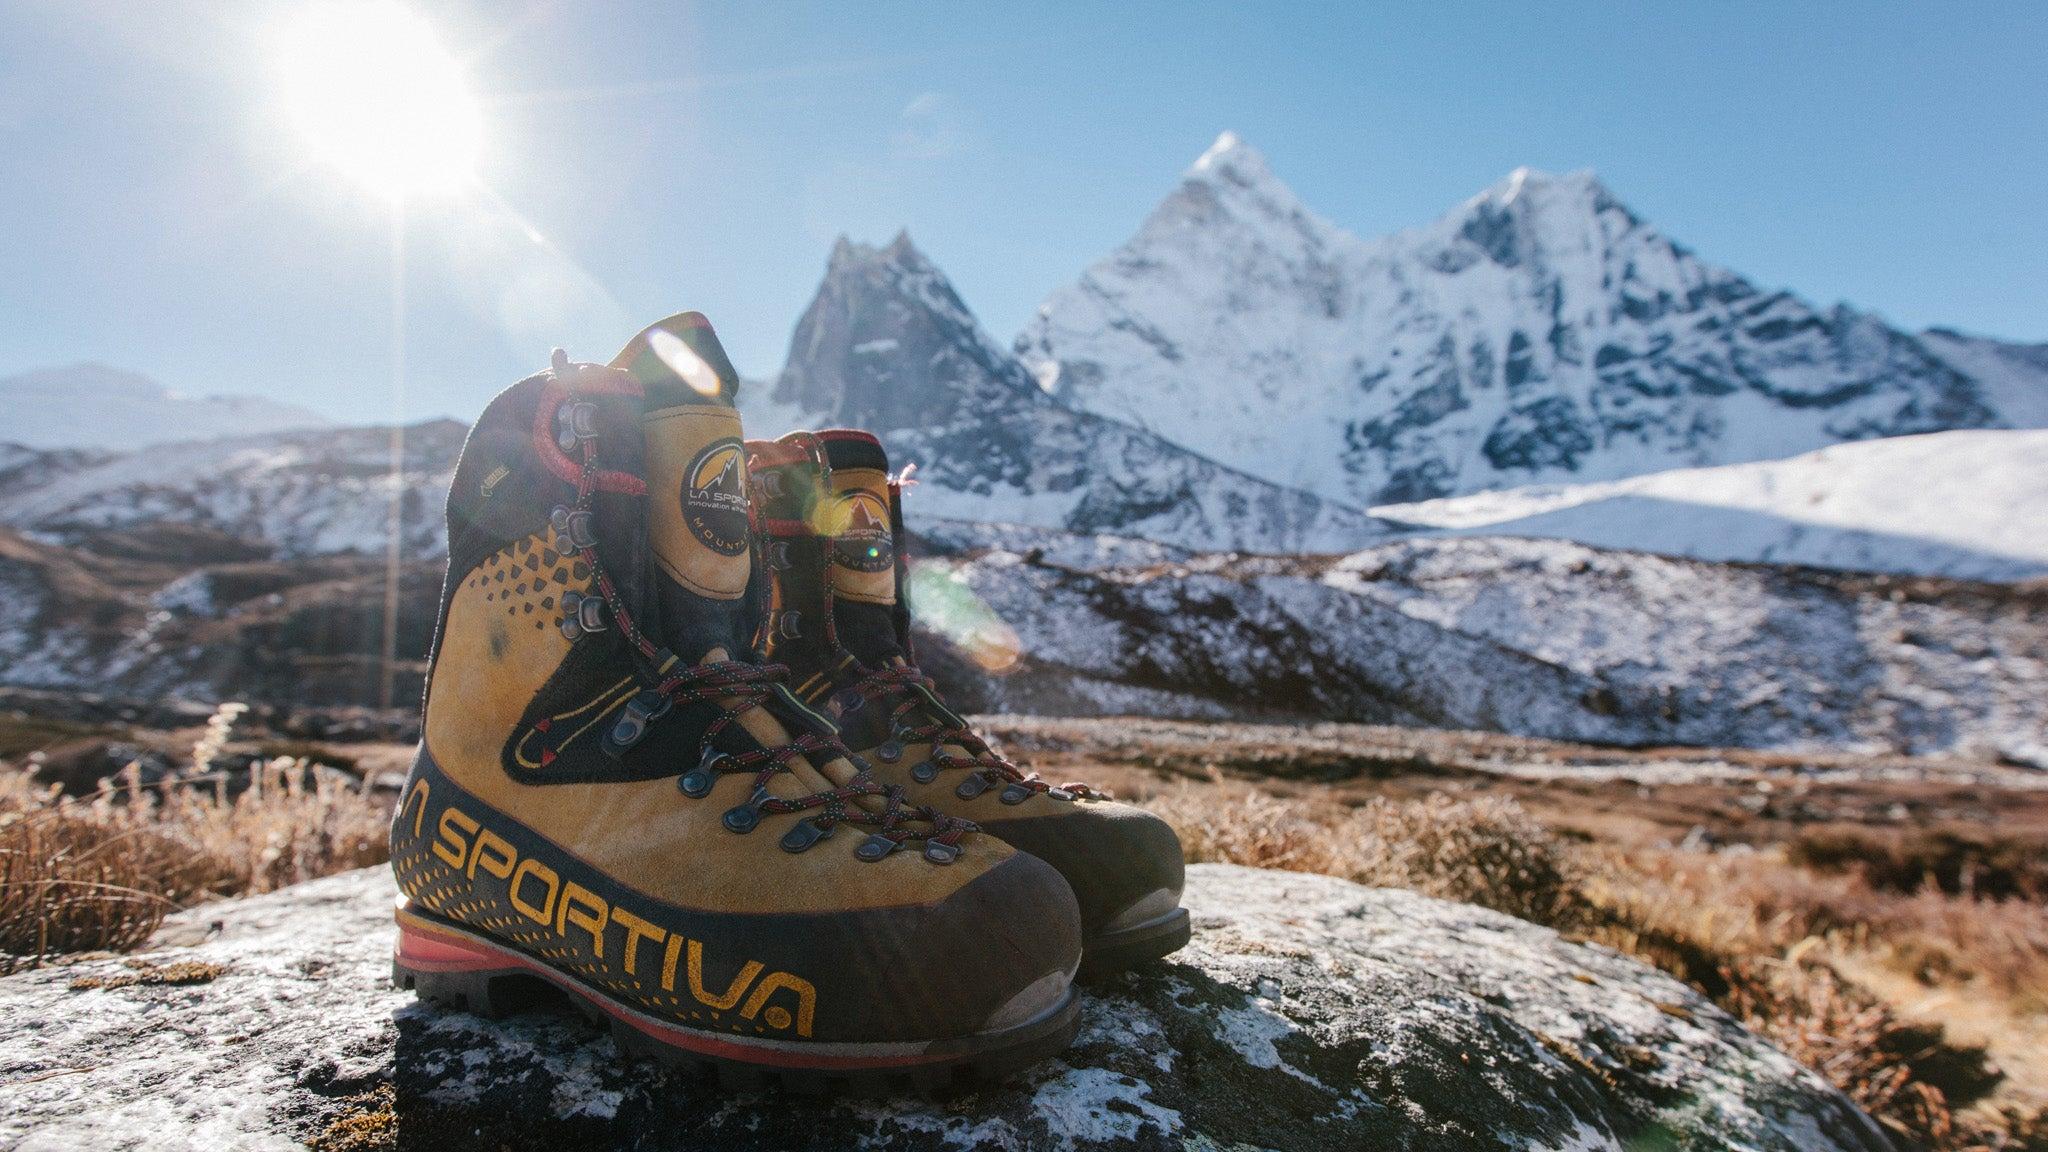 Adventure Tested: La Sportiva Nepal Cube GTX